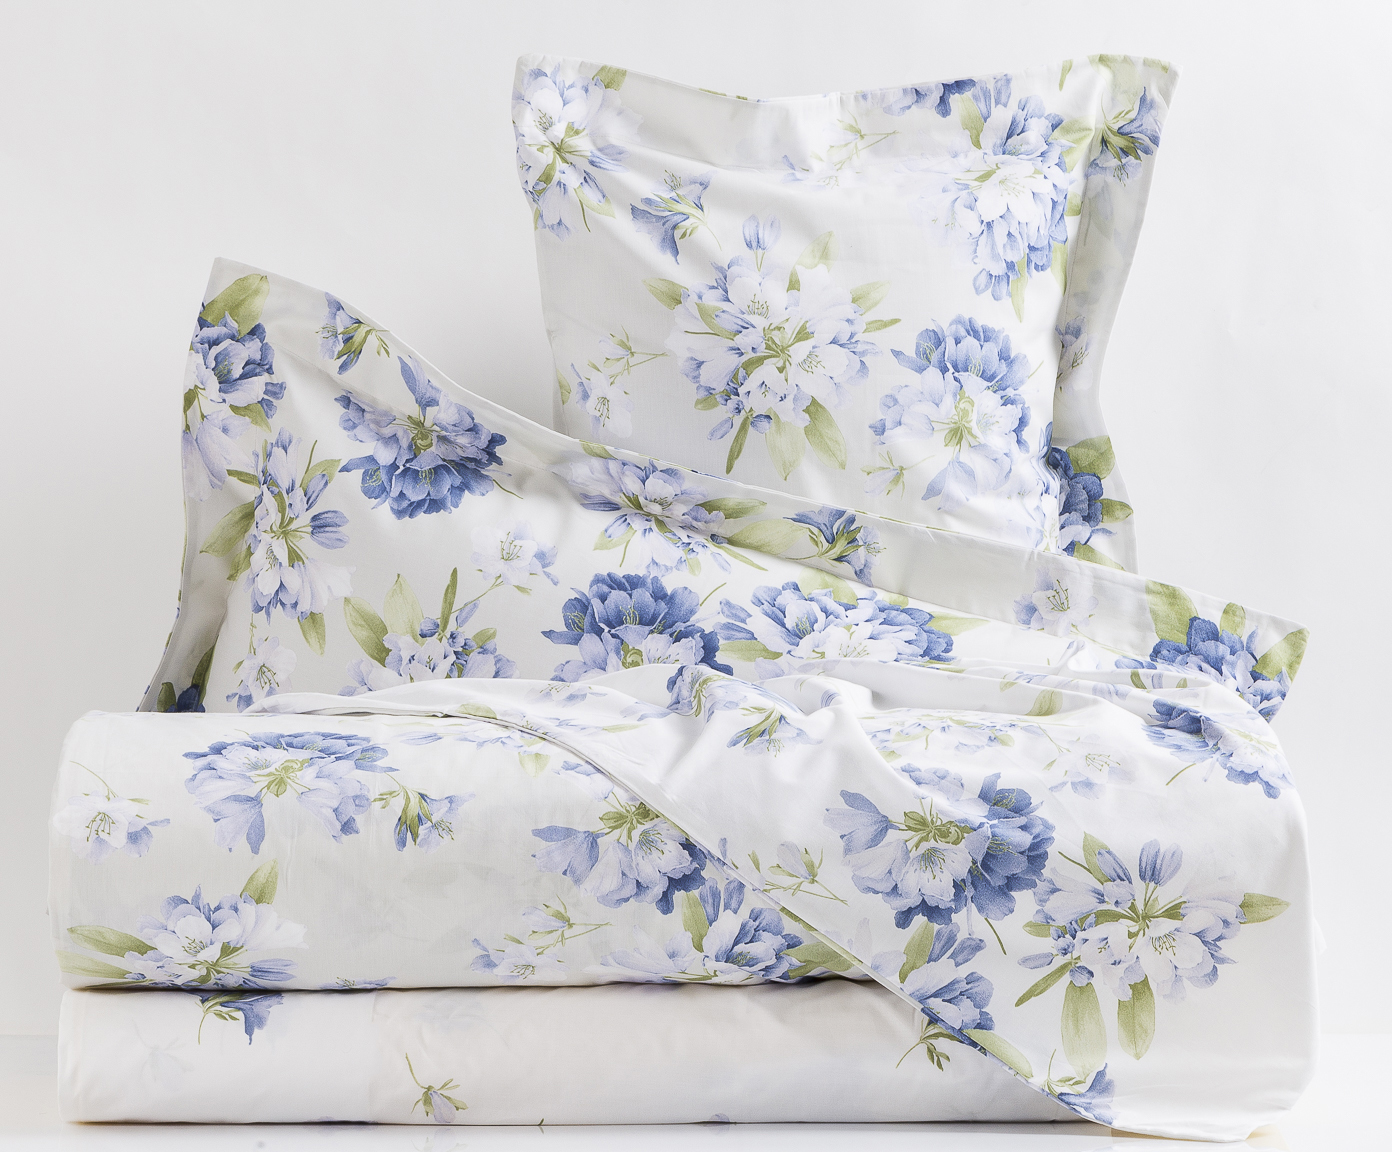 Комплекты Постельное белье семейное Mirabello Rododendri с голубыми цветами elitnoe-postelnoe-belie-rododendri-s-golubymi-tsvetami-ot-mirabello.jpg